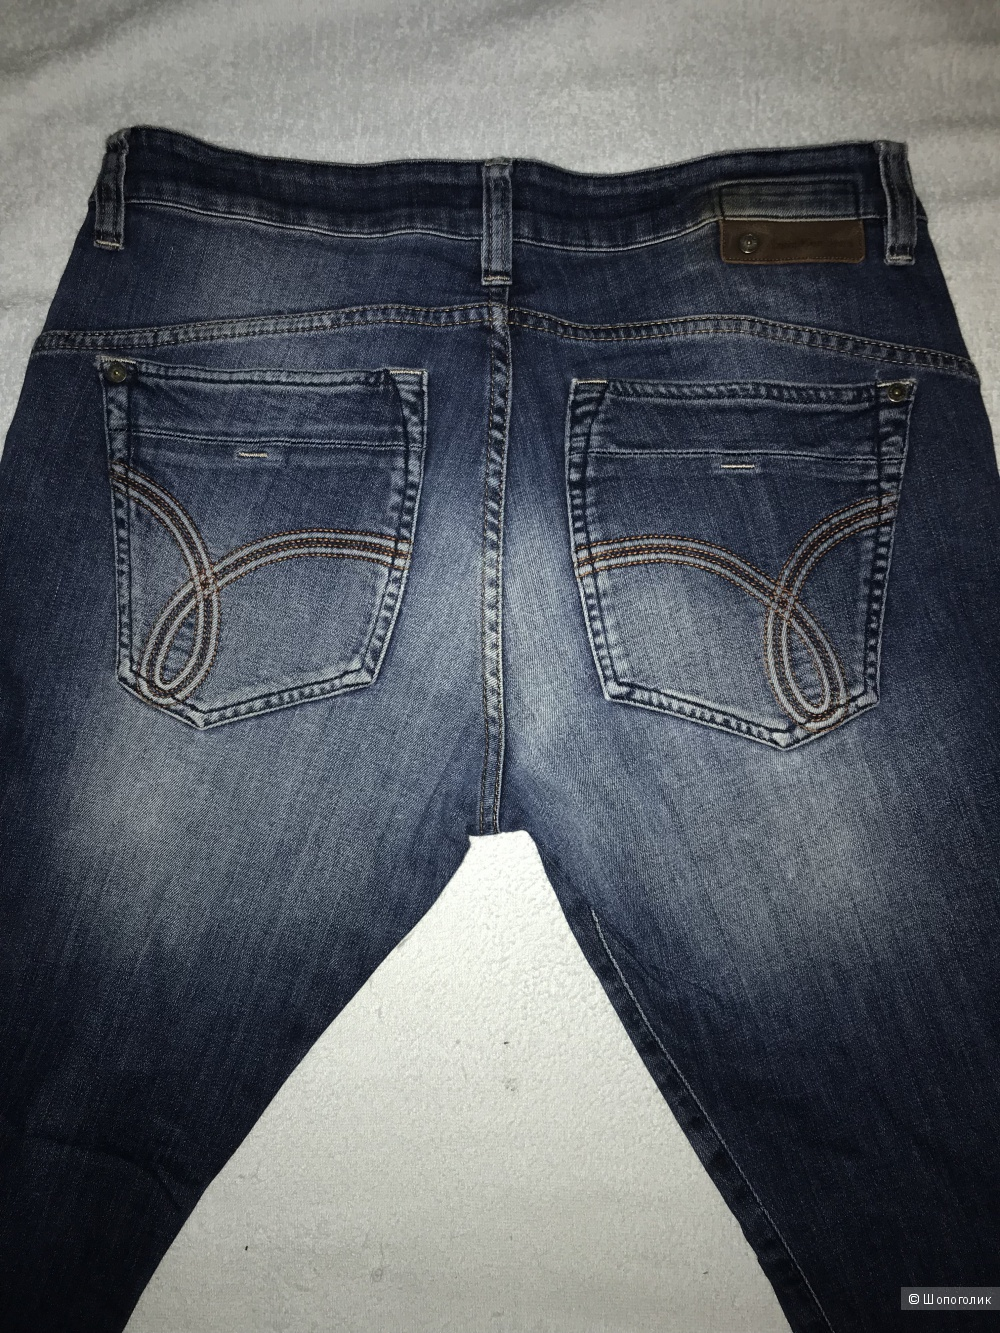 Мужские Джинсы Calvin Klein, размер 32 W 34L